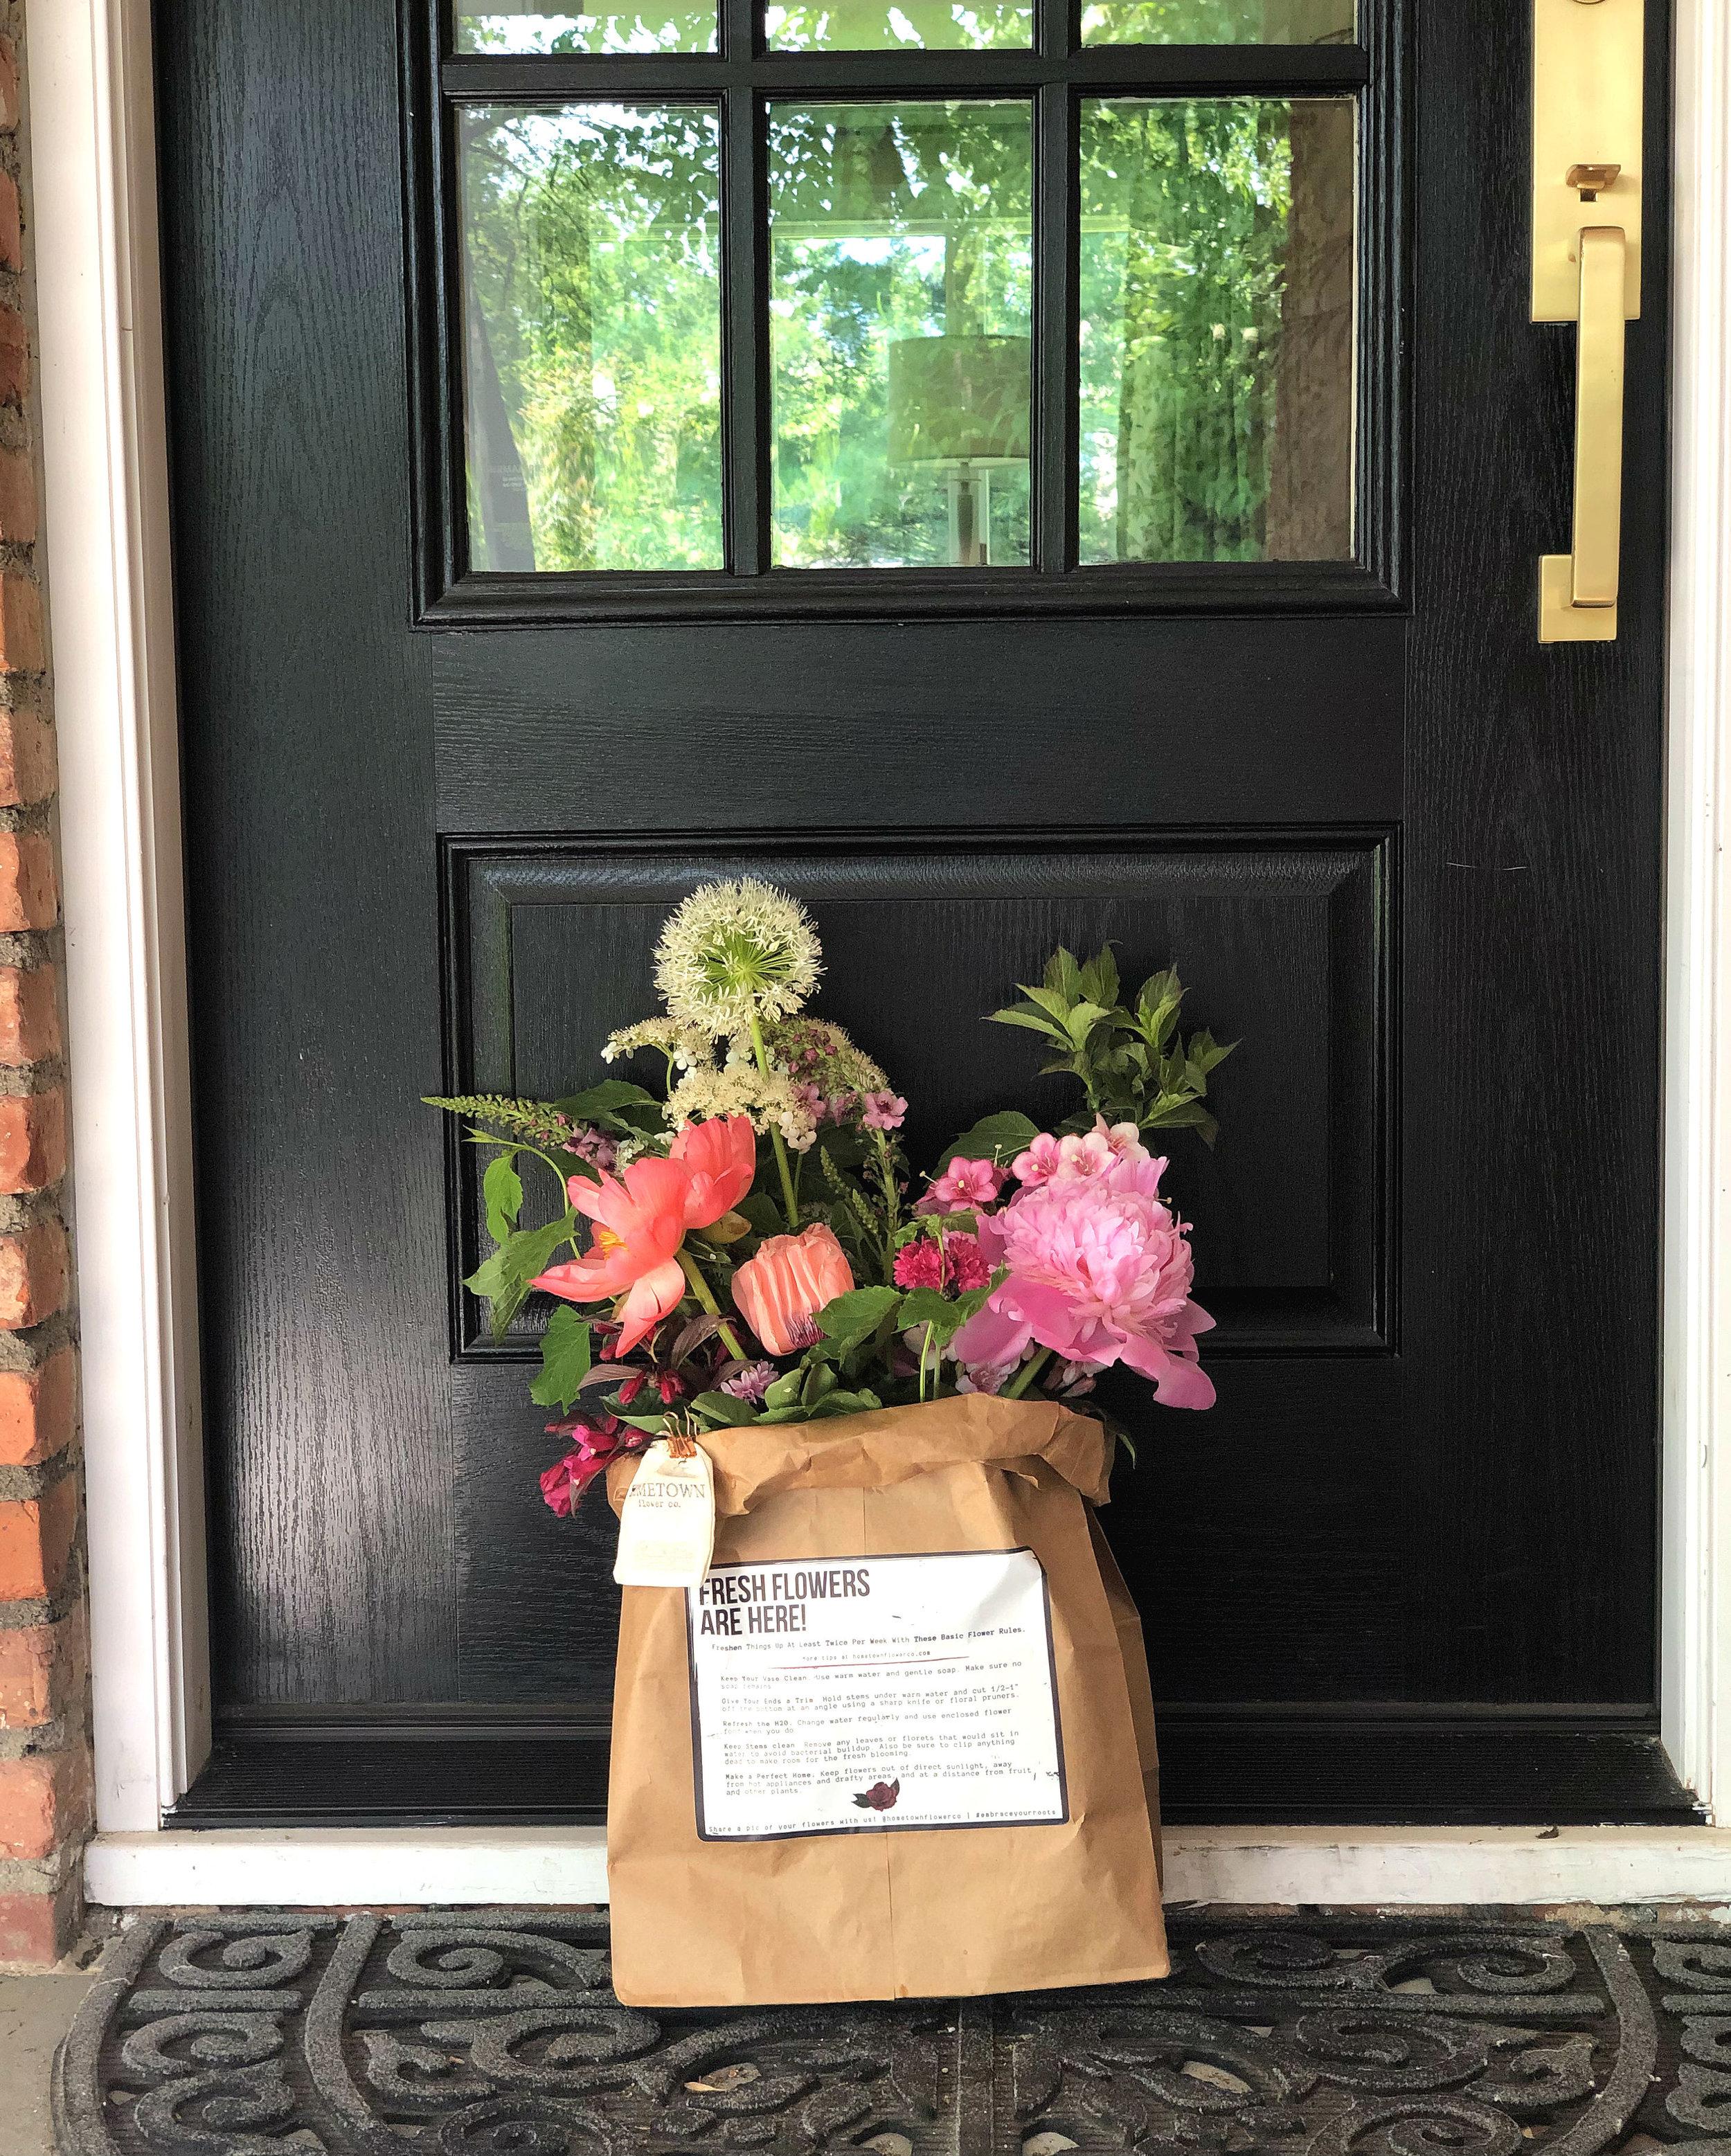 flowersinabag on doorstep.jpg